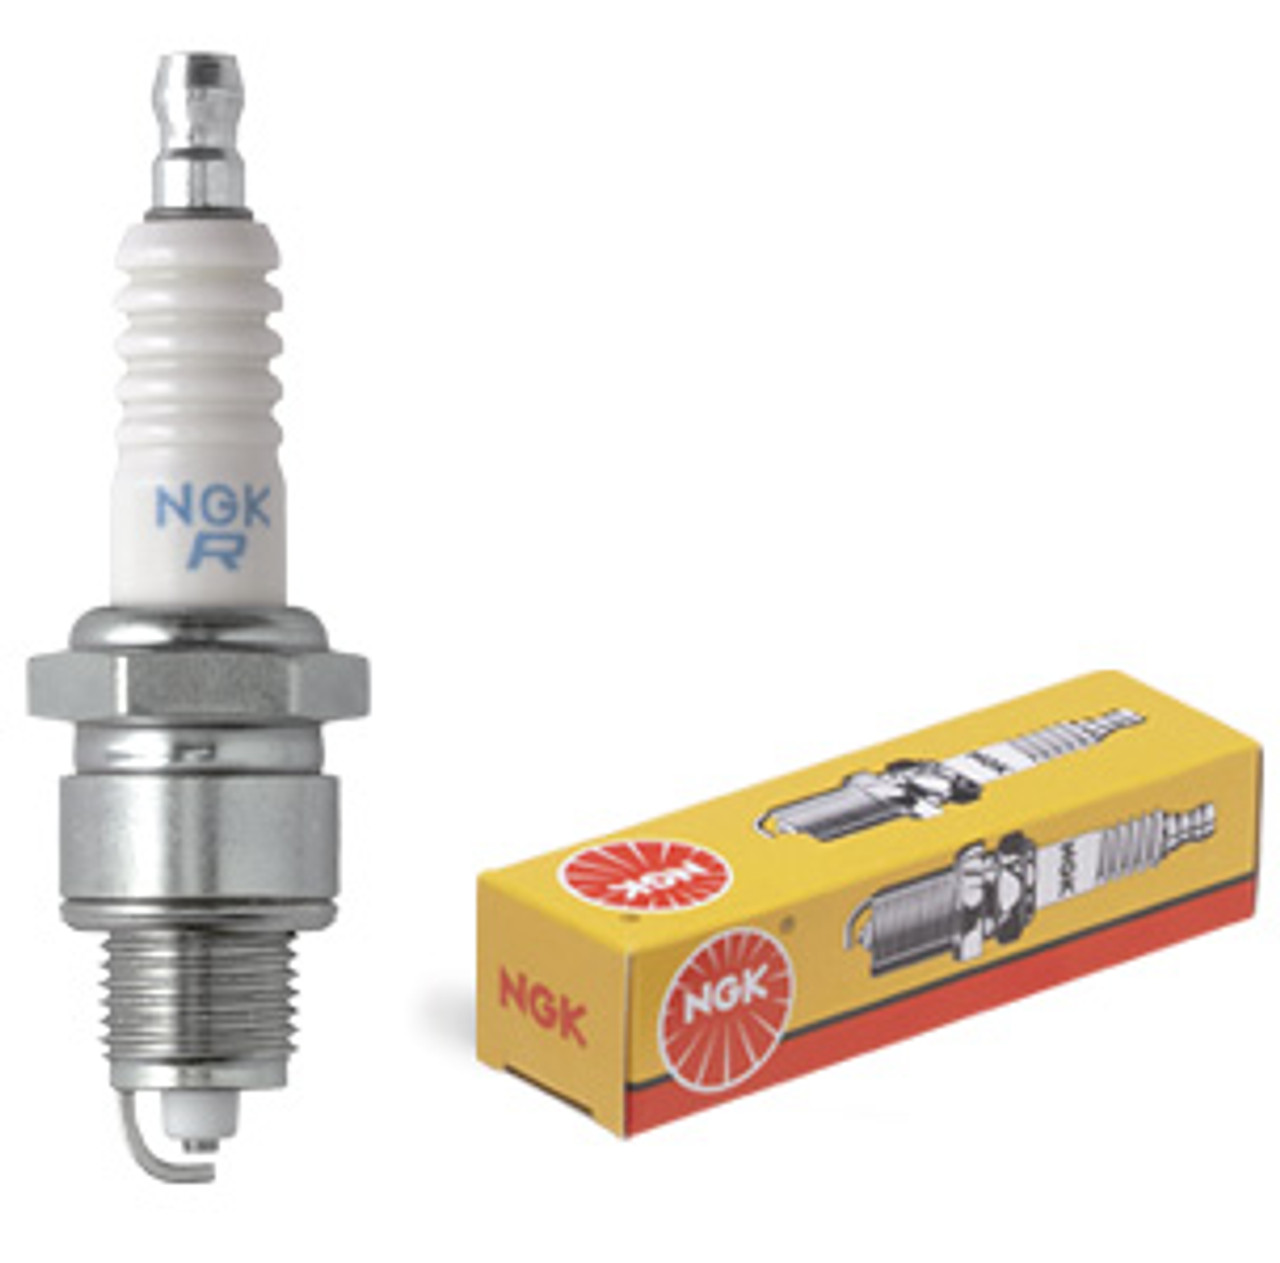 NGK Spark Plug - Taotao SSR - C7HSA